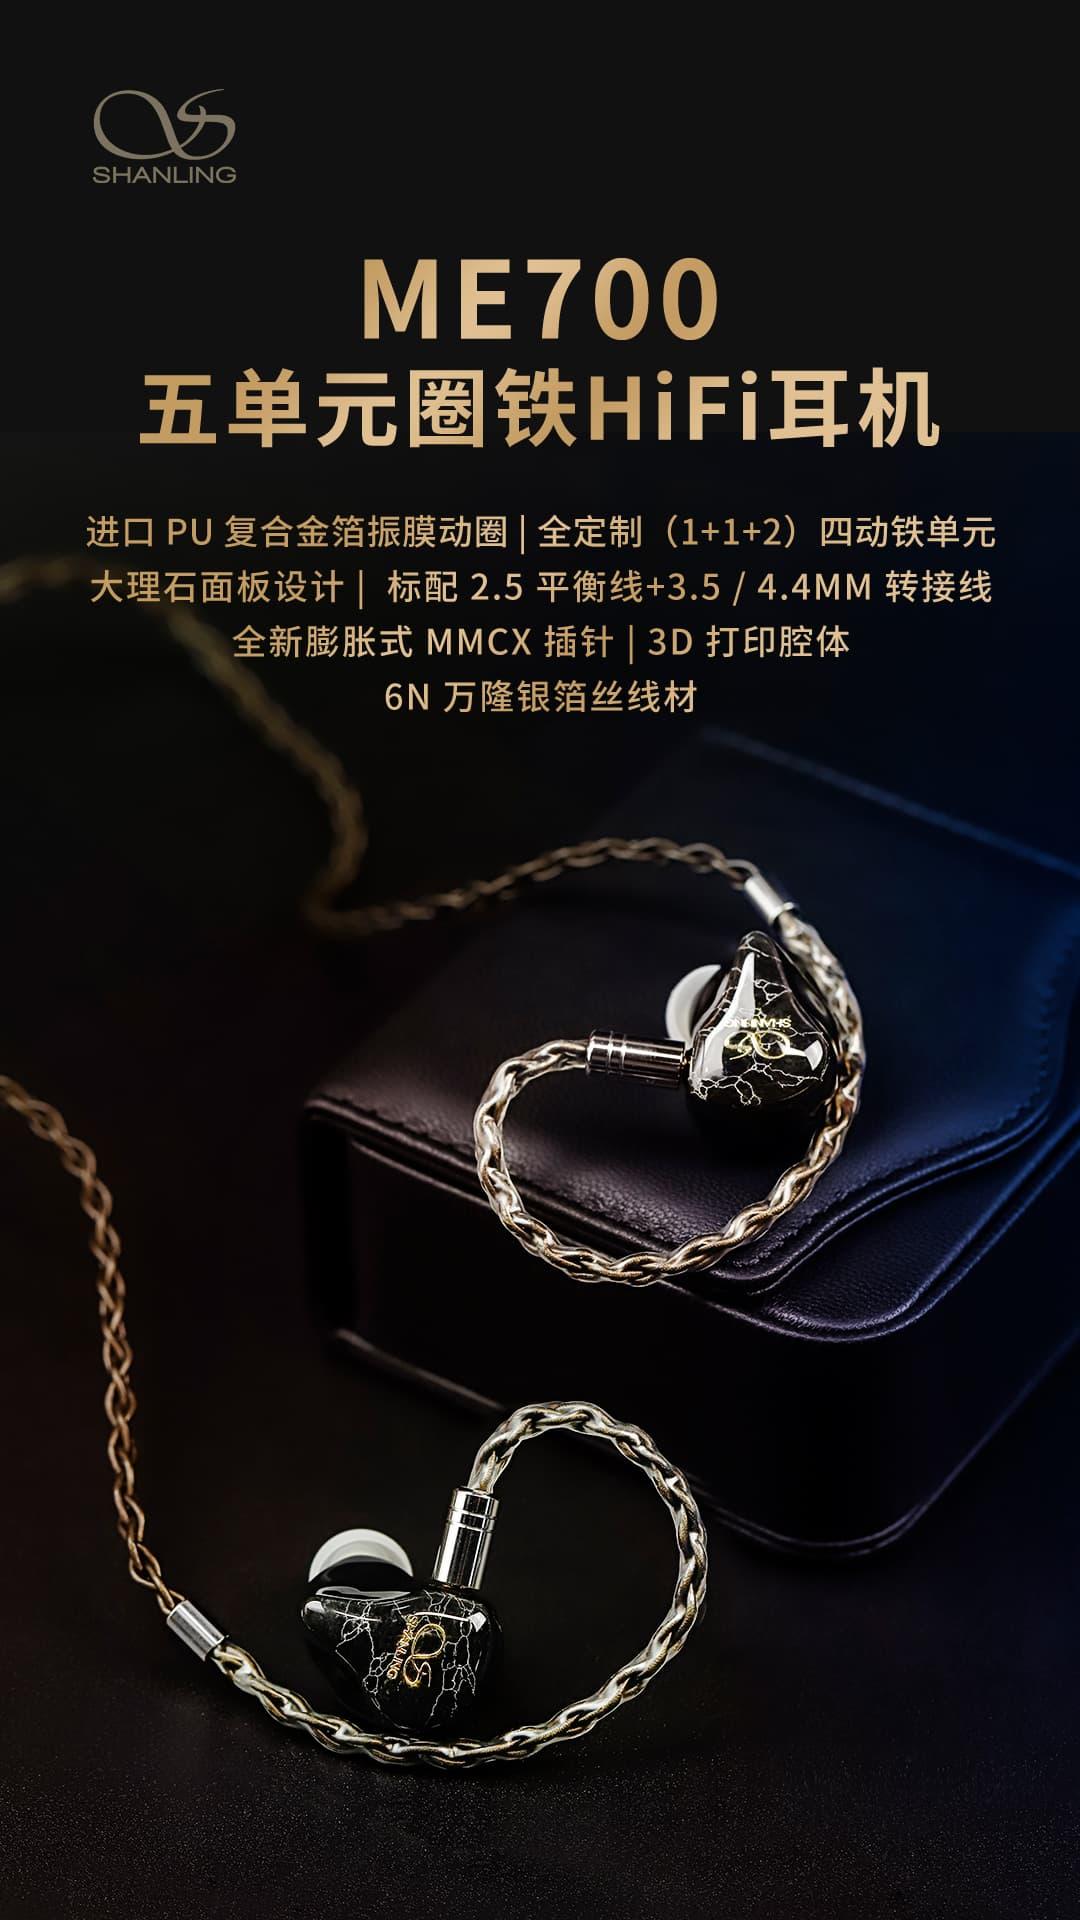 ME700 宣传海报-1.jpg